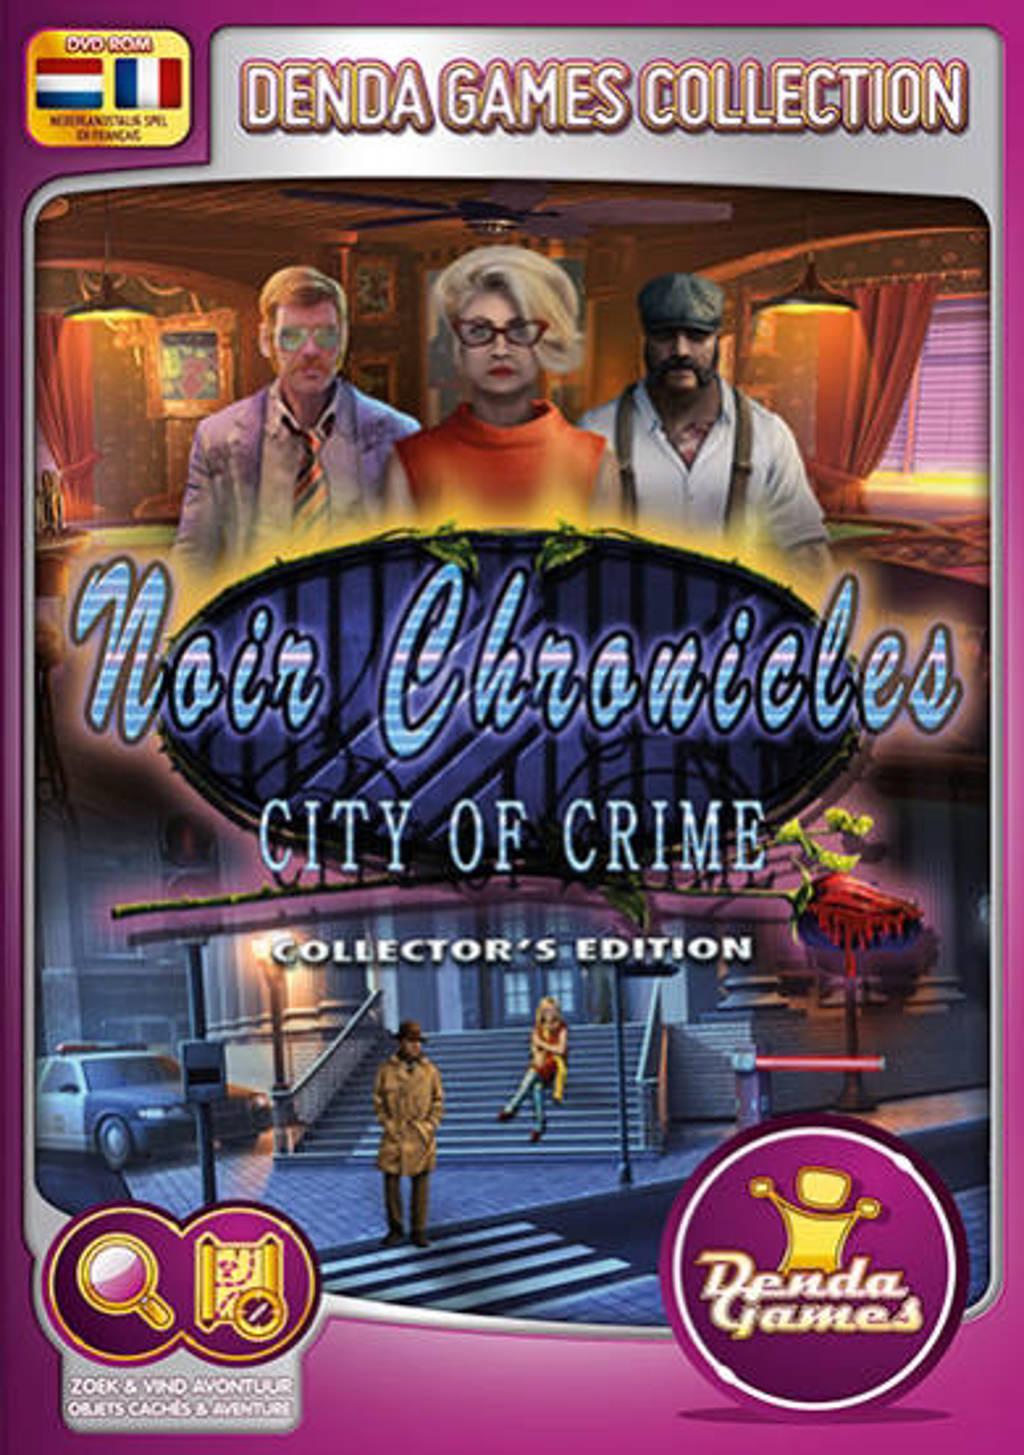 Noir chronicles - City of crime (Collectors edition) (PC)